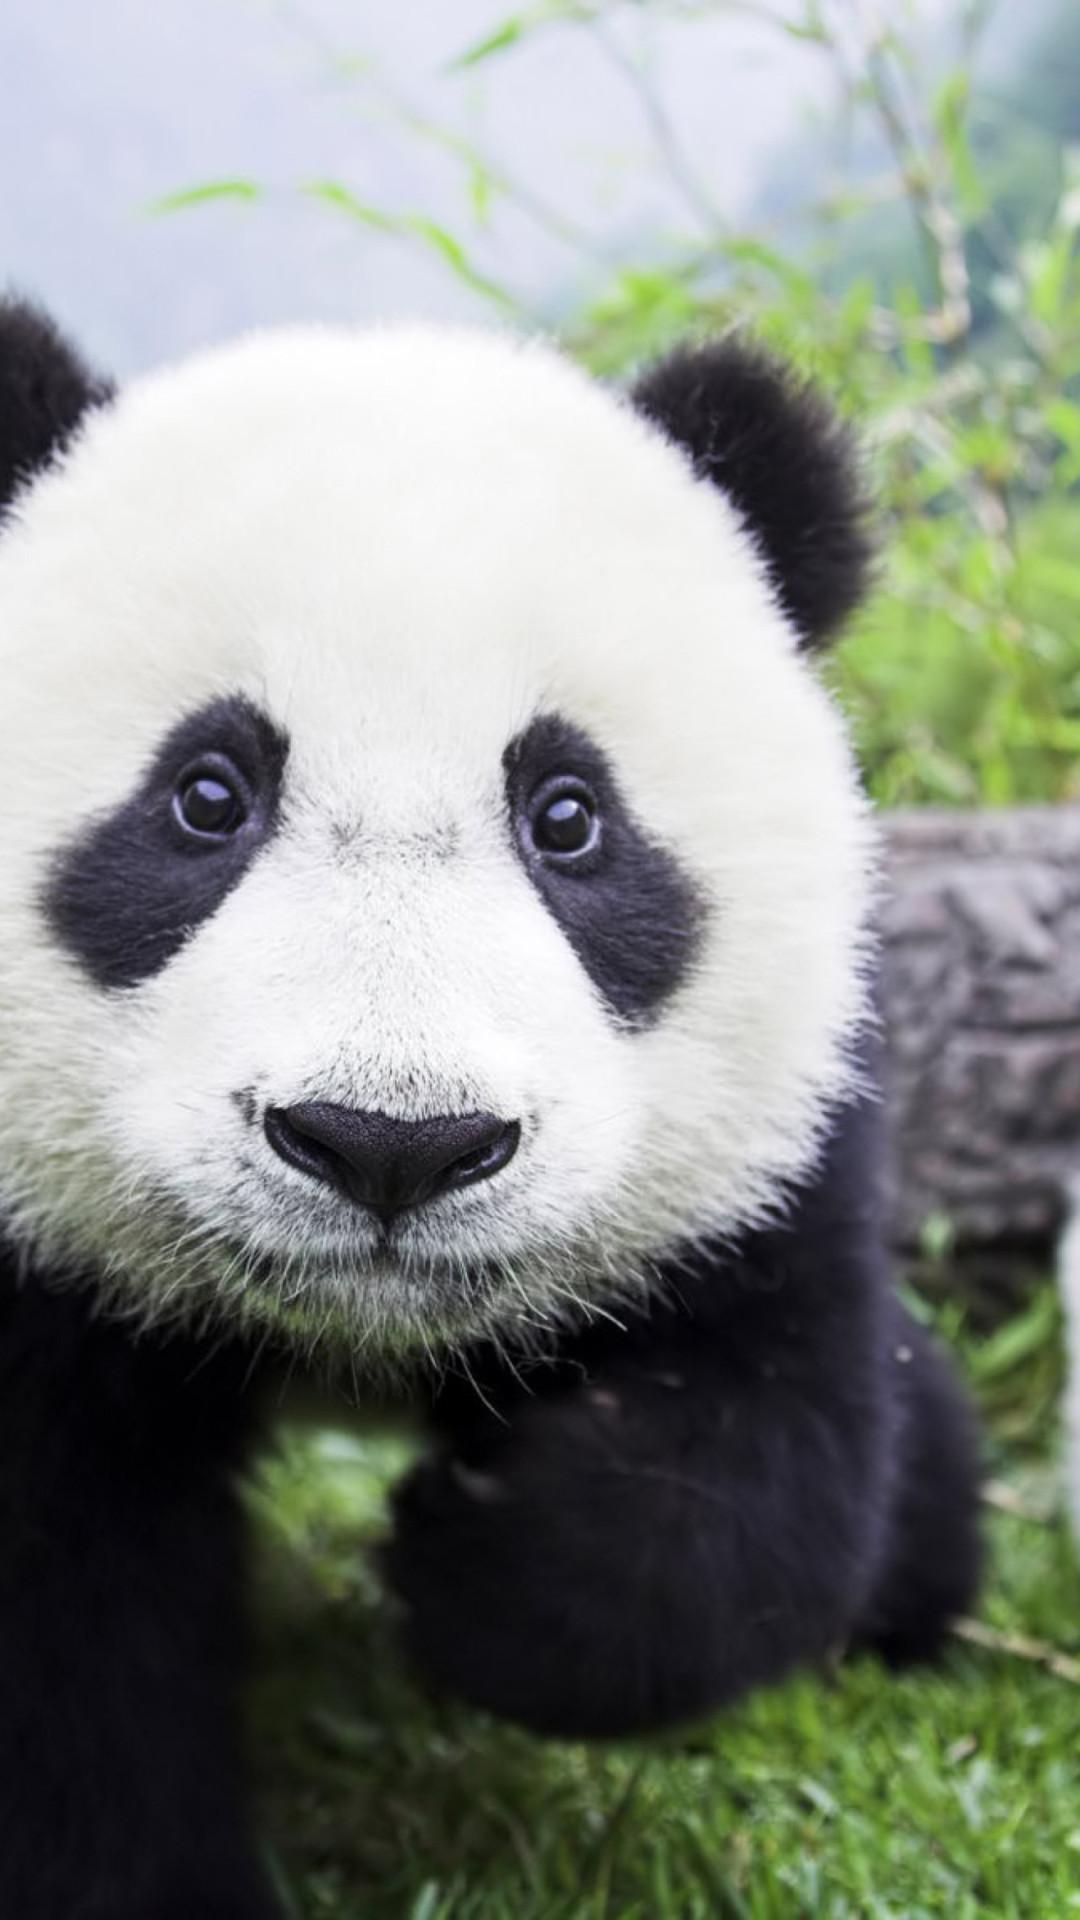 Giant Panda Closeup Iphone Wallpaper Hd